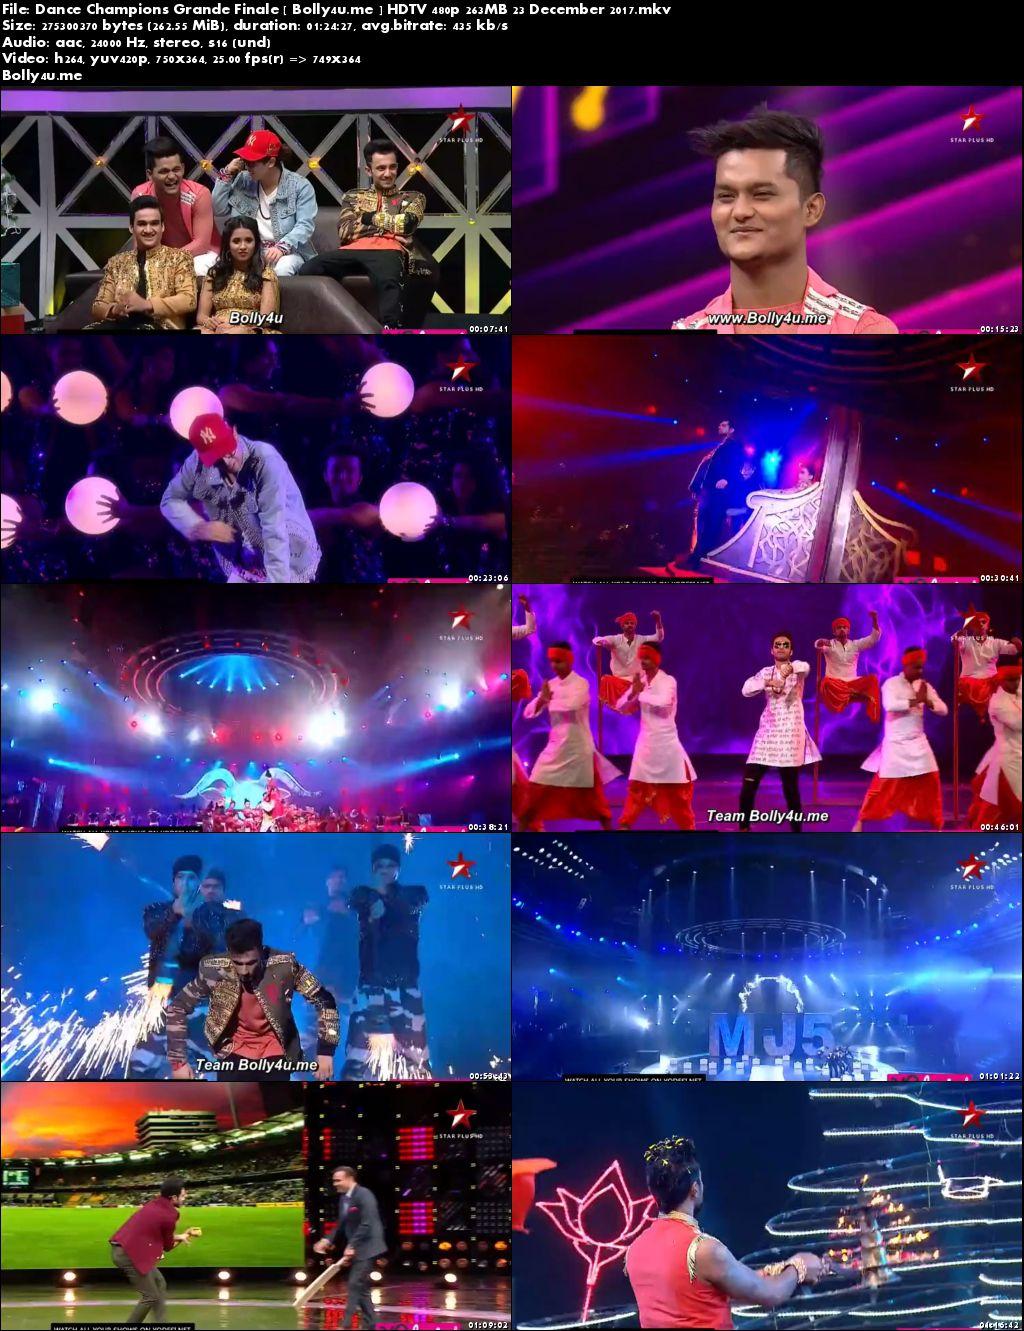 Dance Champions HDTV 480p 250MB Grand Finale 23 Dec 2017 Download